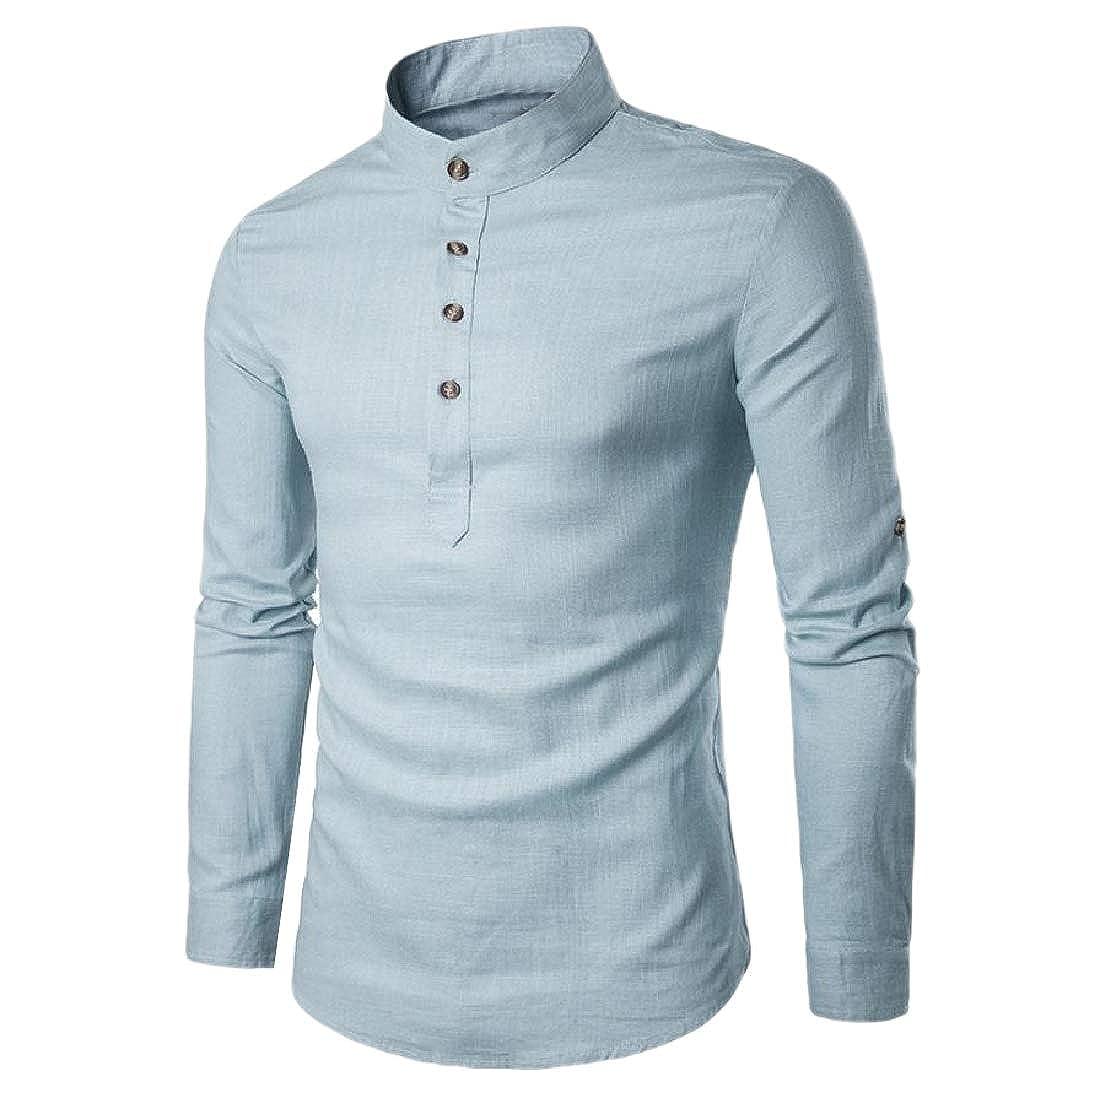 SportsX Men Mao Collar Pure Color Woven Tops Career Button-Down-Shirts